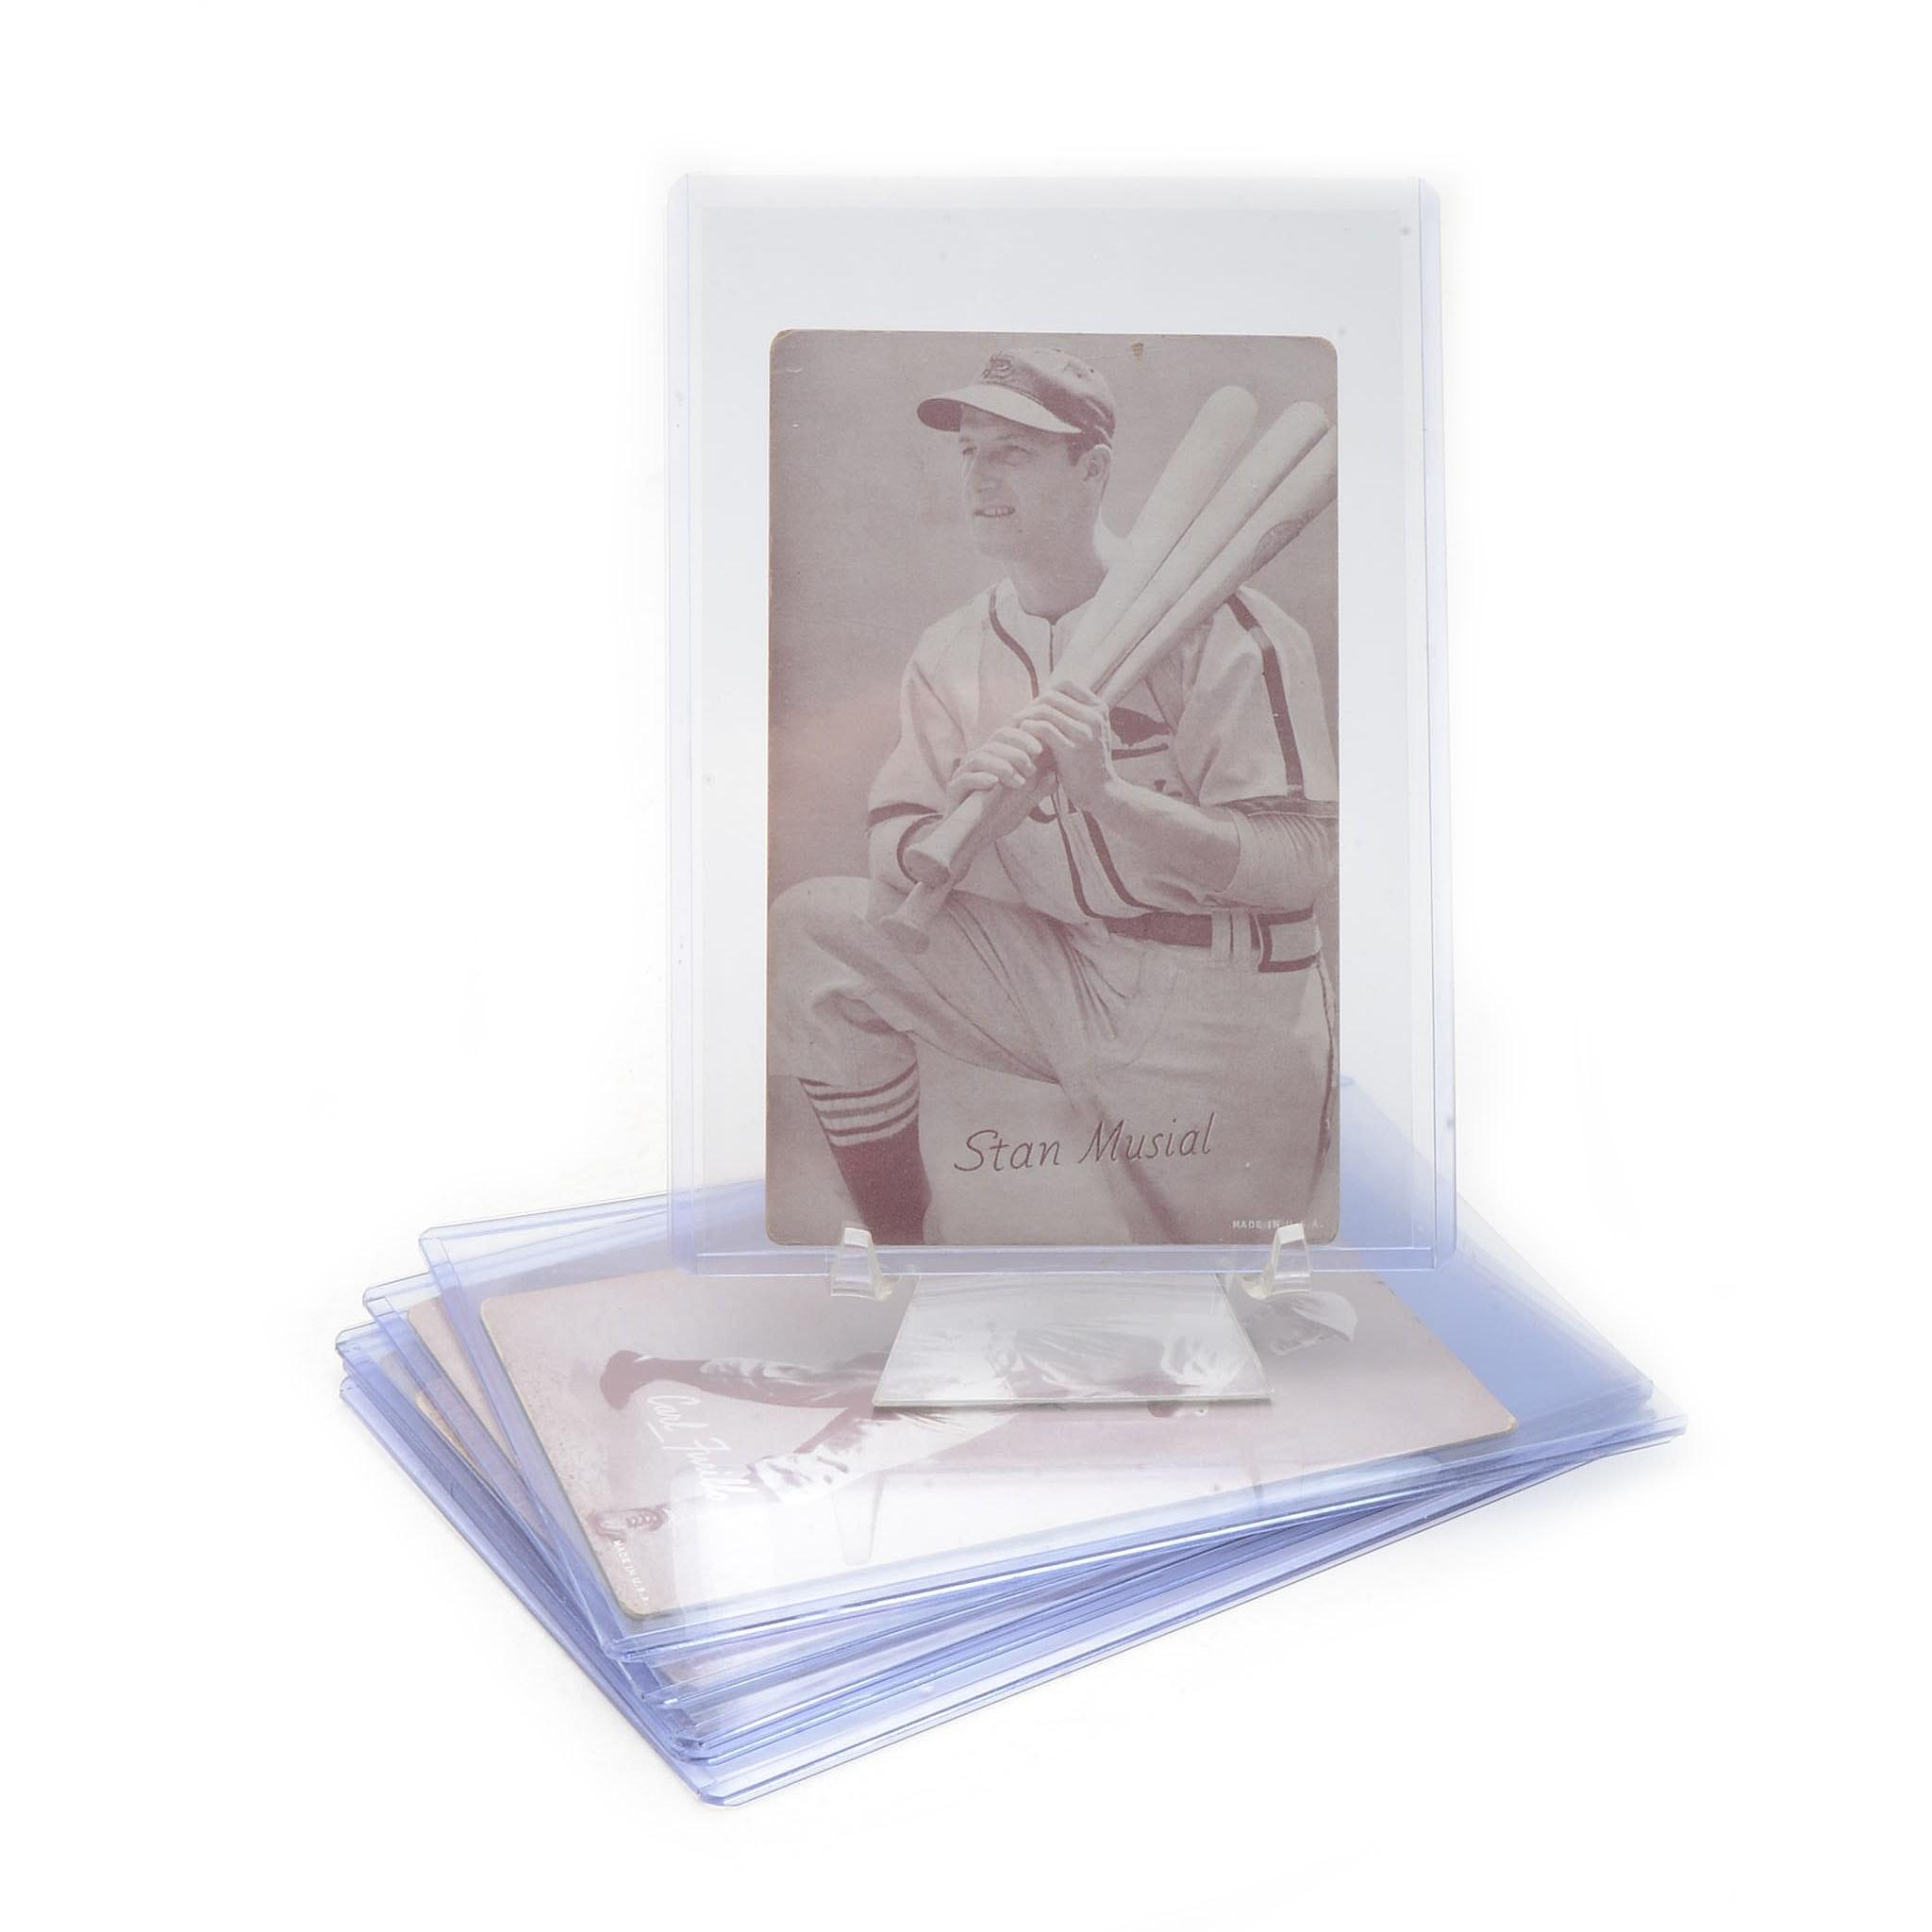 Six 1940s Exhibit Baseball Cards